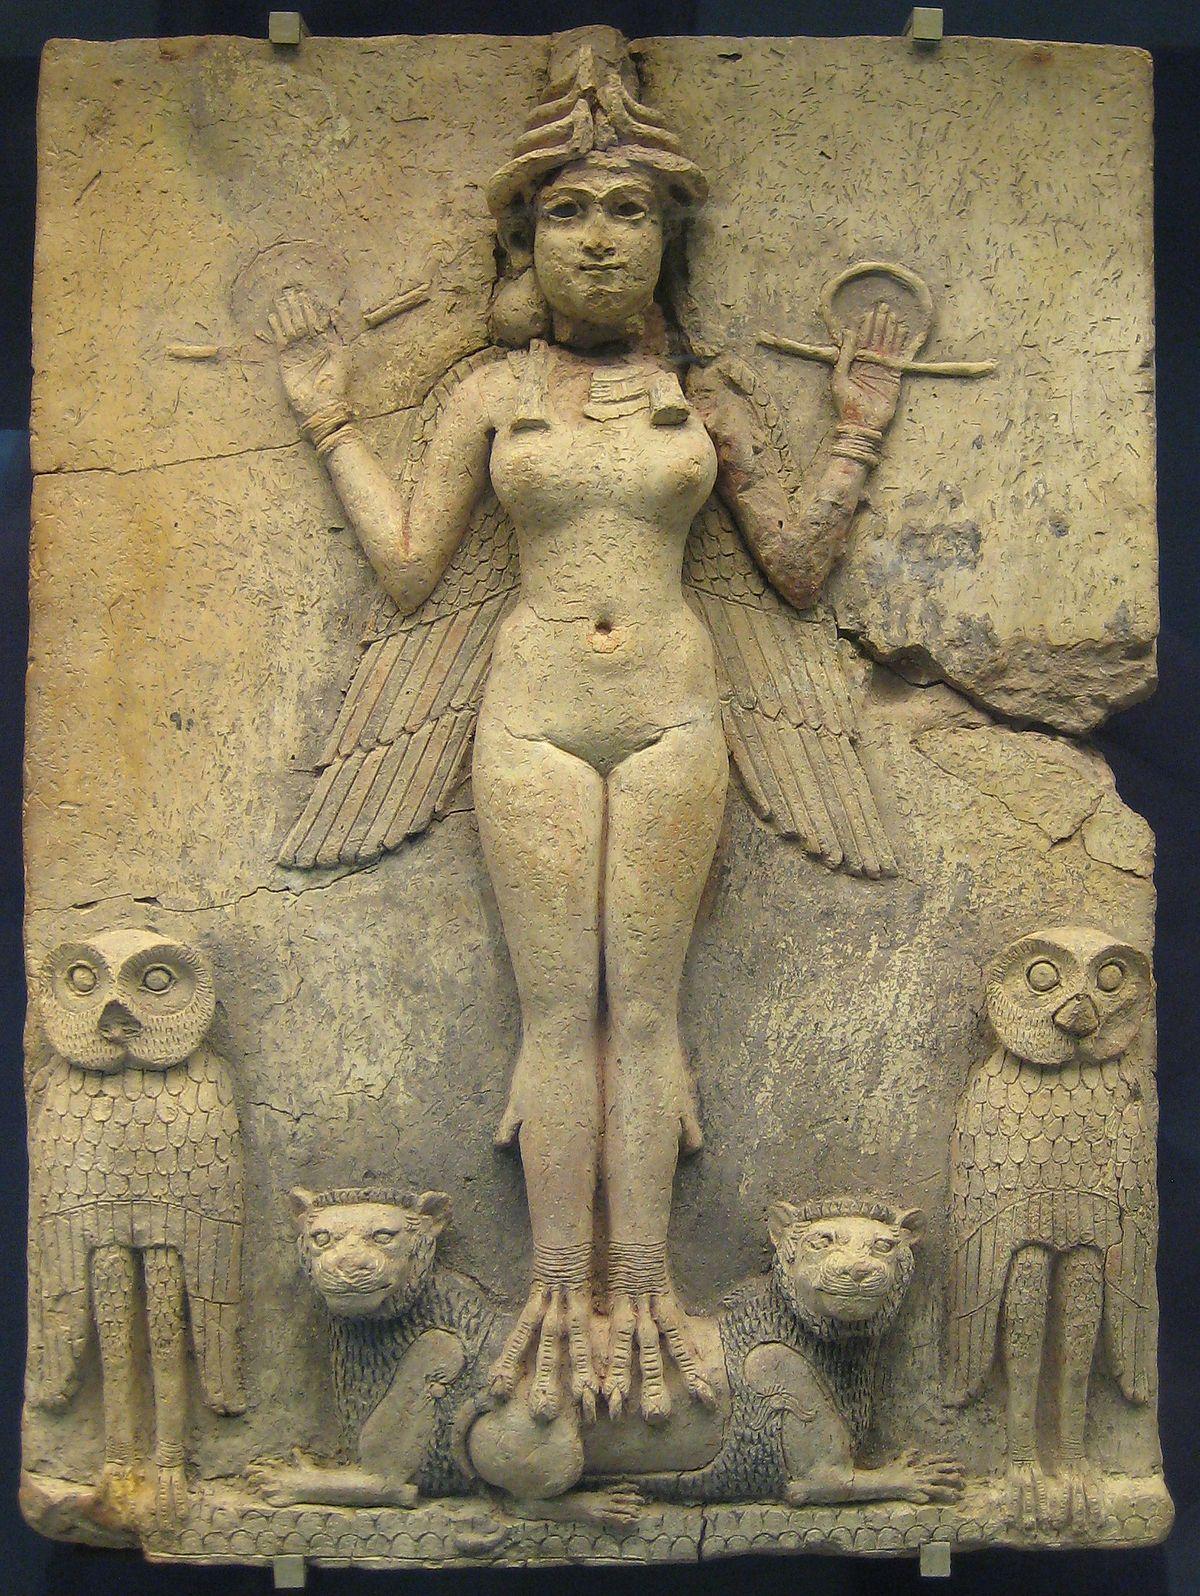 1200px-British_Museum_Queen_of_the_Night